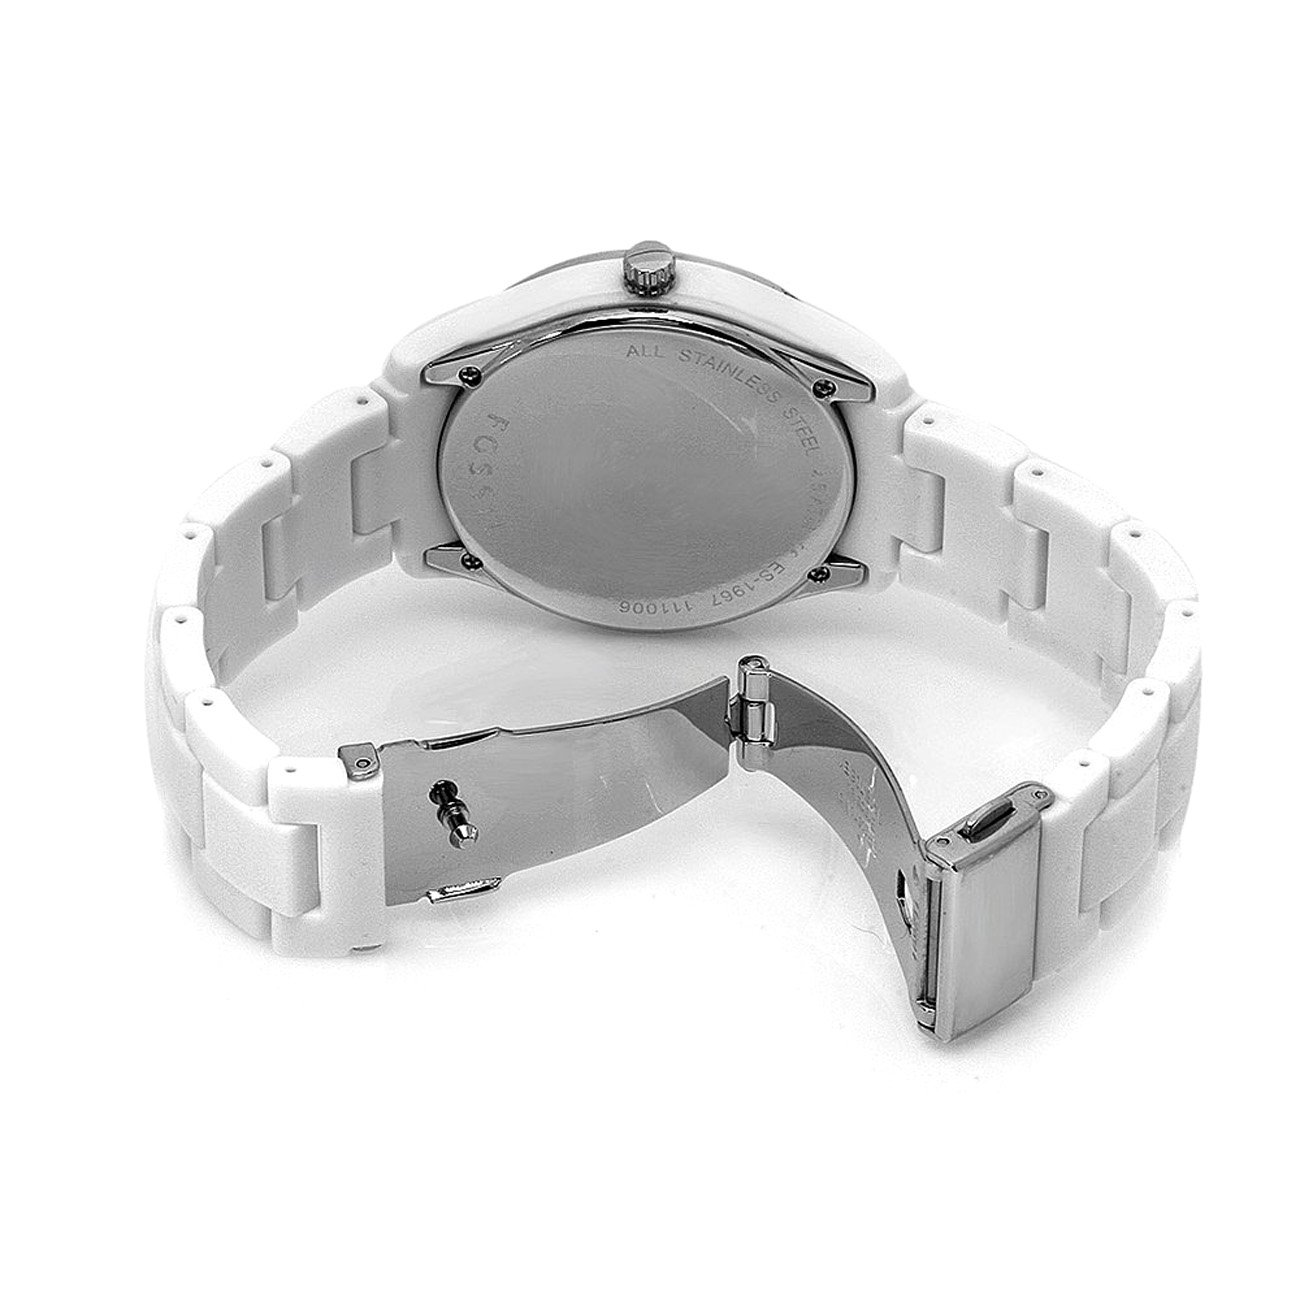 Đồng hồ Fossil Womens ES1967 Stella Day/ Date Display Quartz White Dial Watch